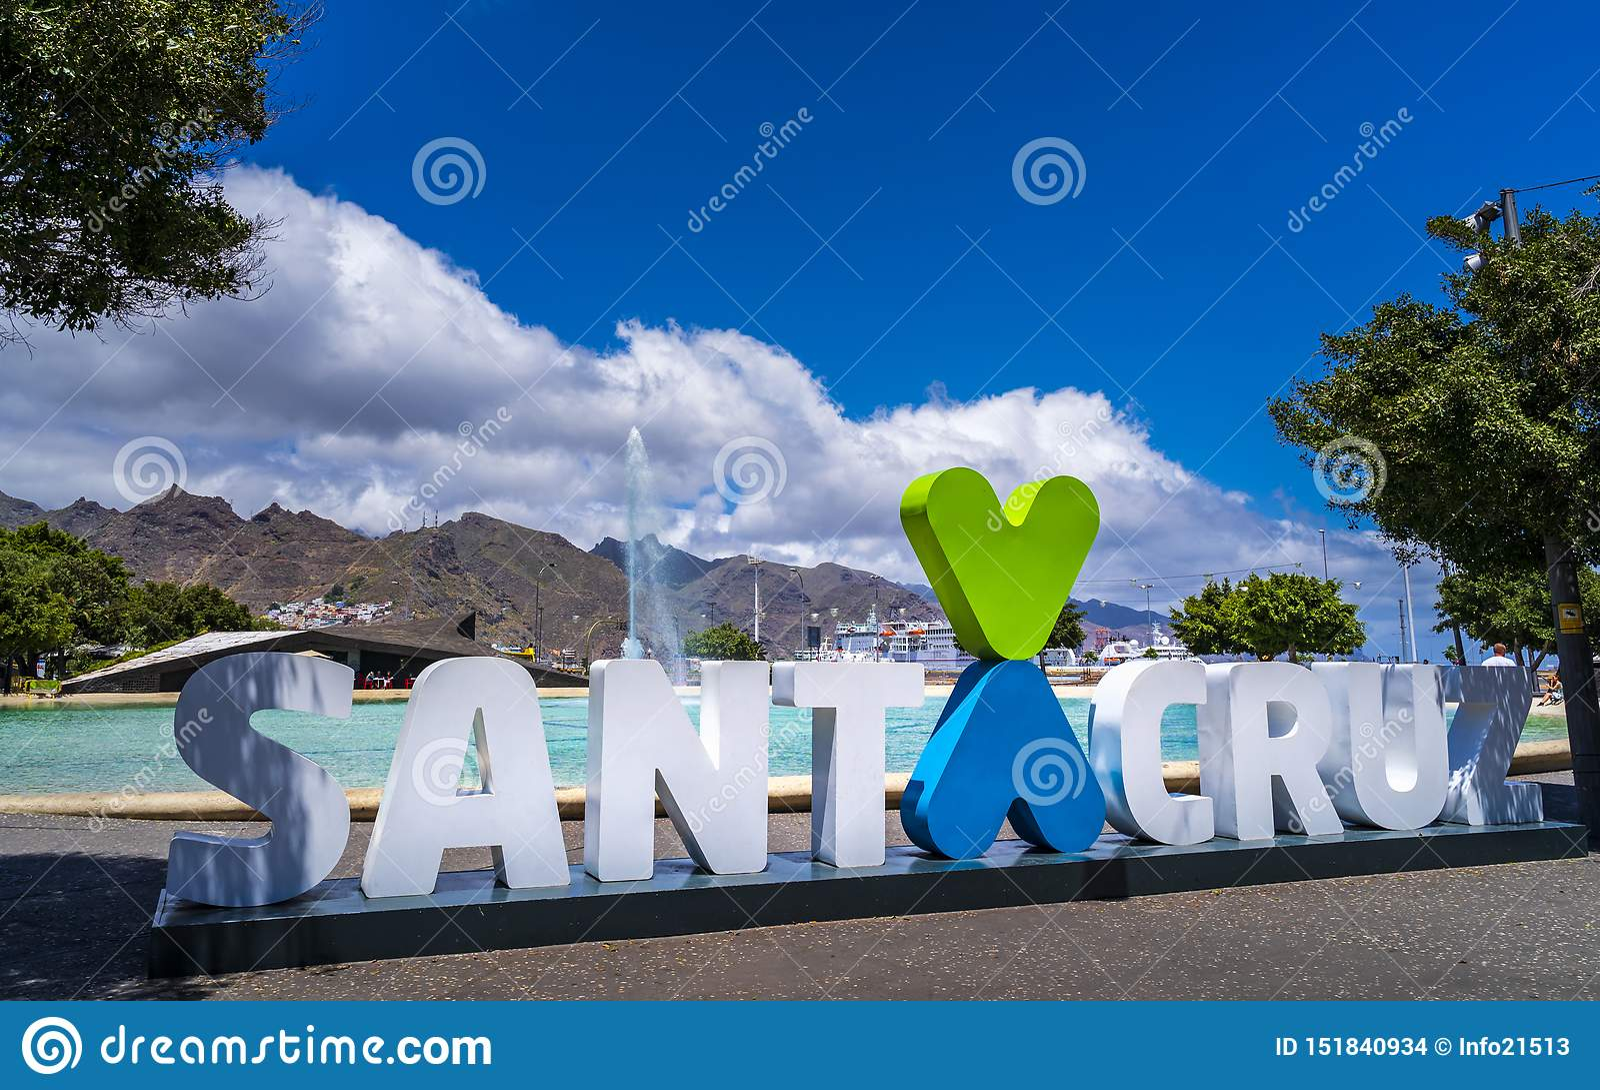 Sign of Santa Cruz de Tenerife